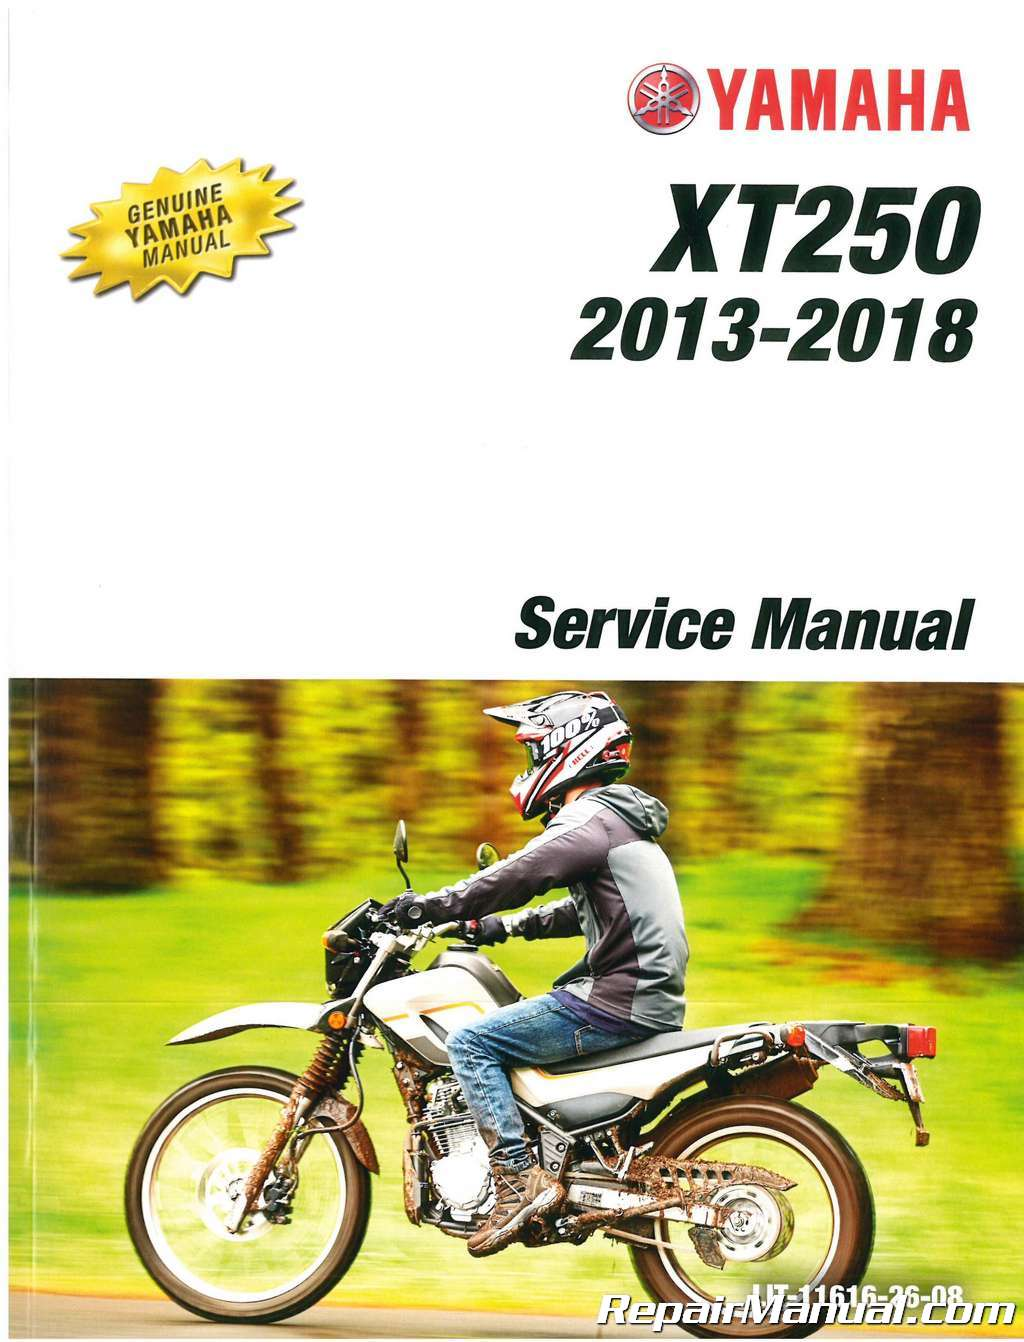 Yamaha TTR125 TT-R125 2012 FULL SERVICE REPAIR SHOP MANUAL ON CD